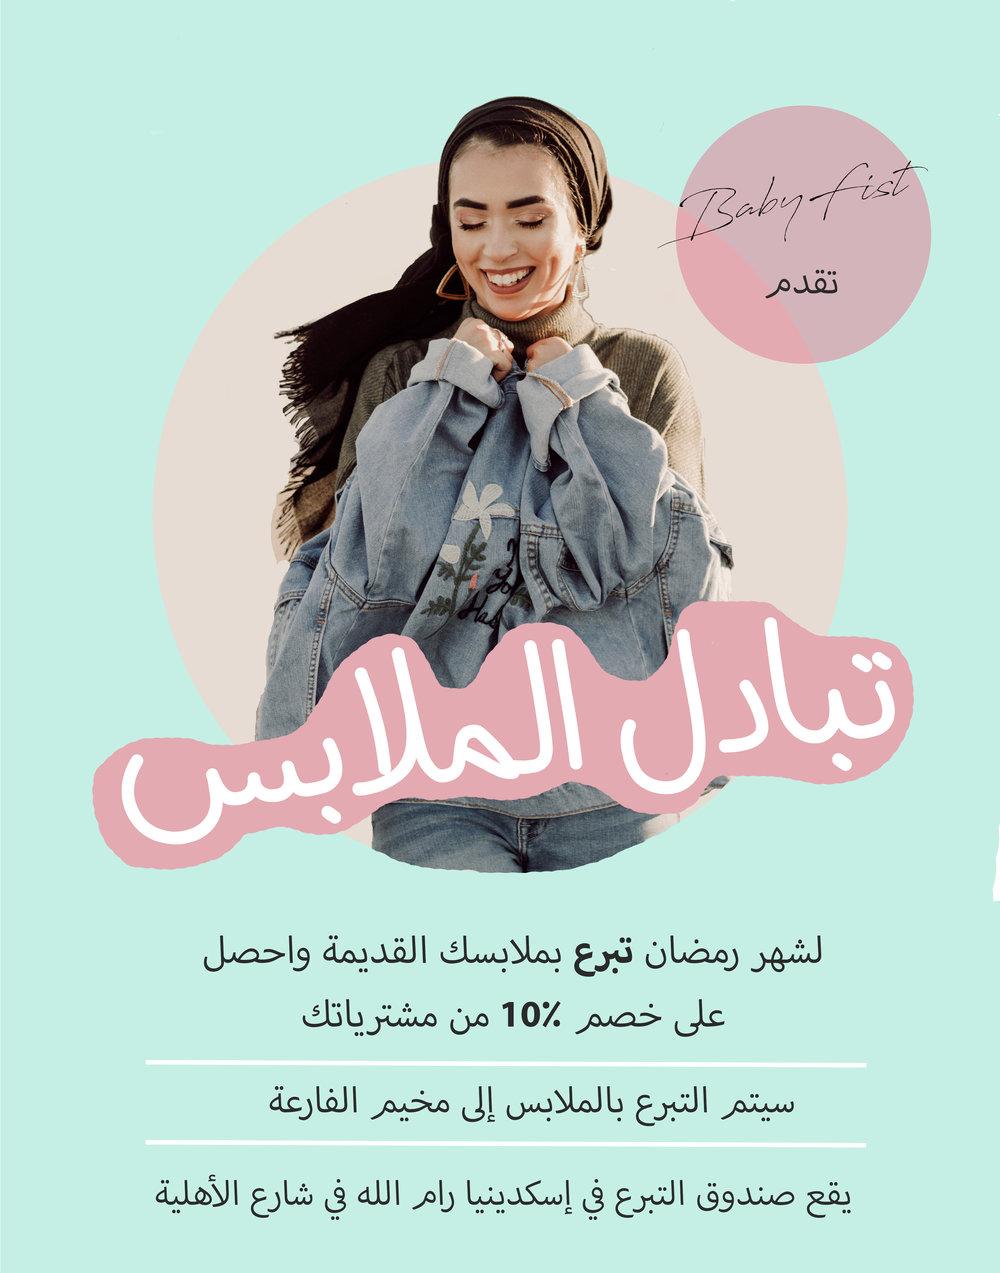 clothes_exchange_poster_arabic.jpg